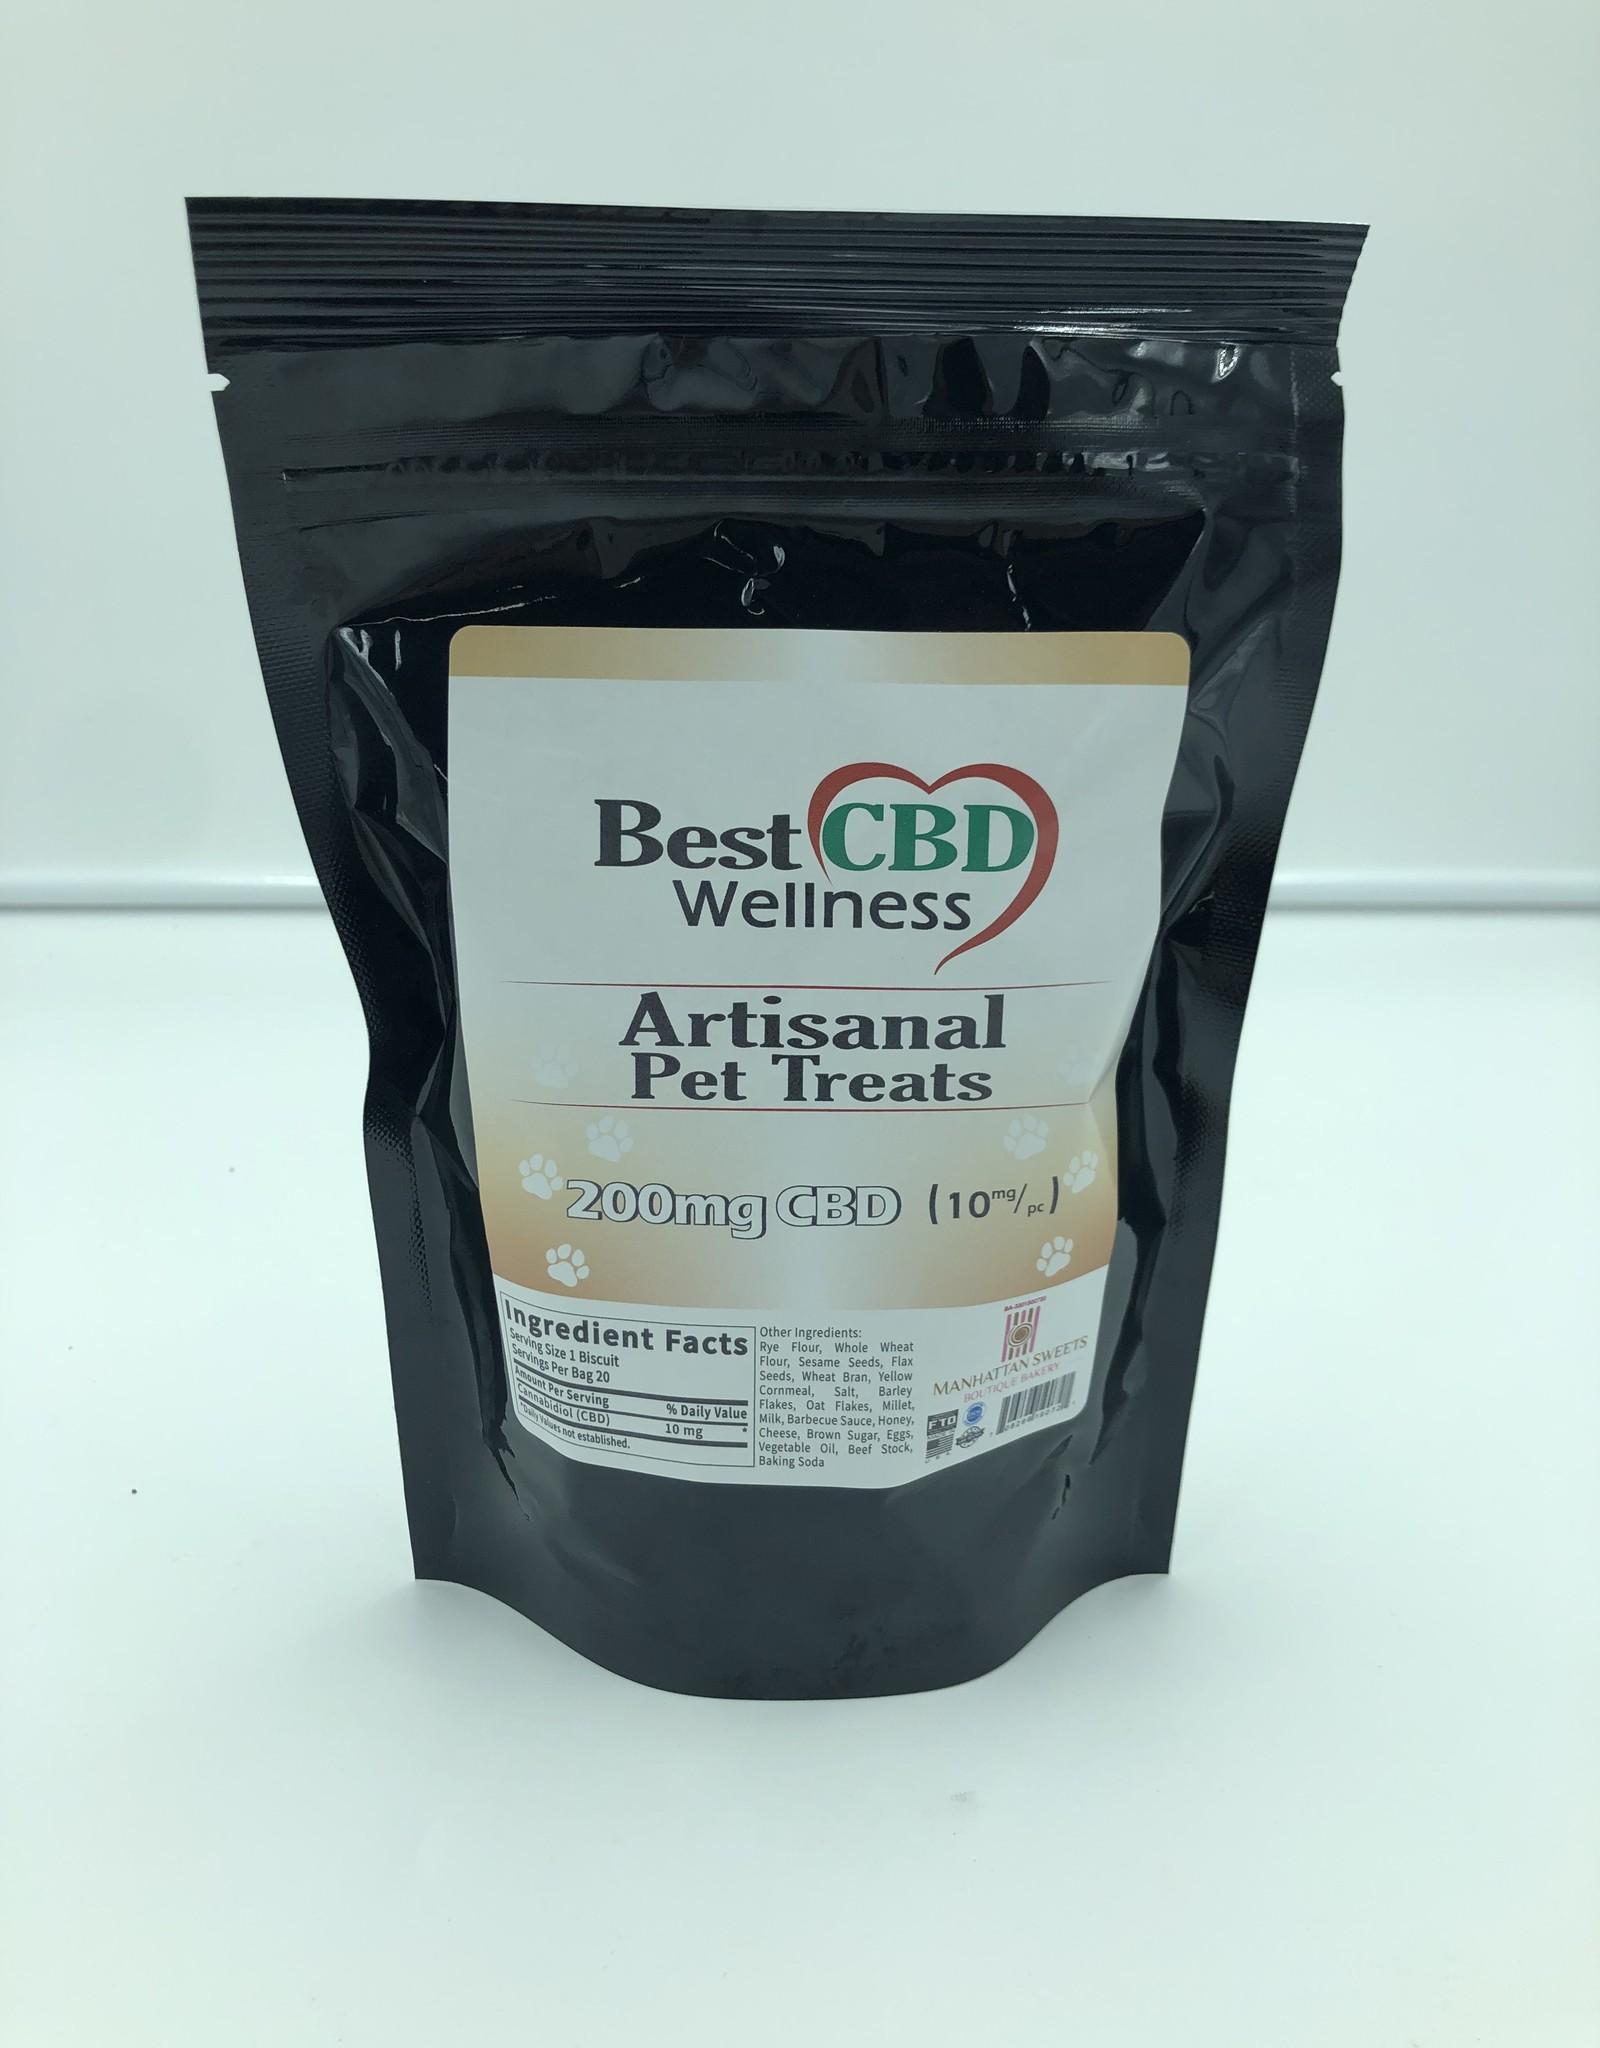 Best CBD Wellness CBD Artisanal Pet Treats 200mg / 20 Treats